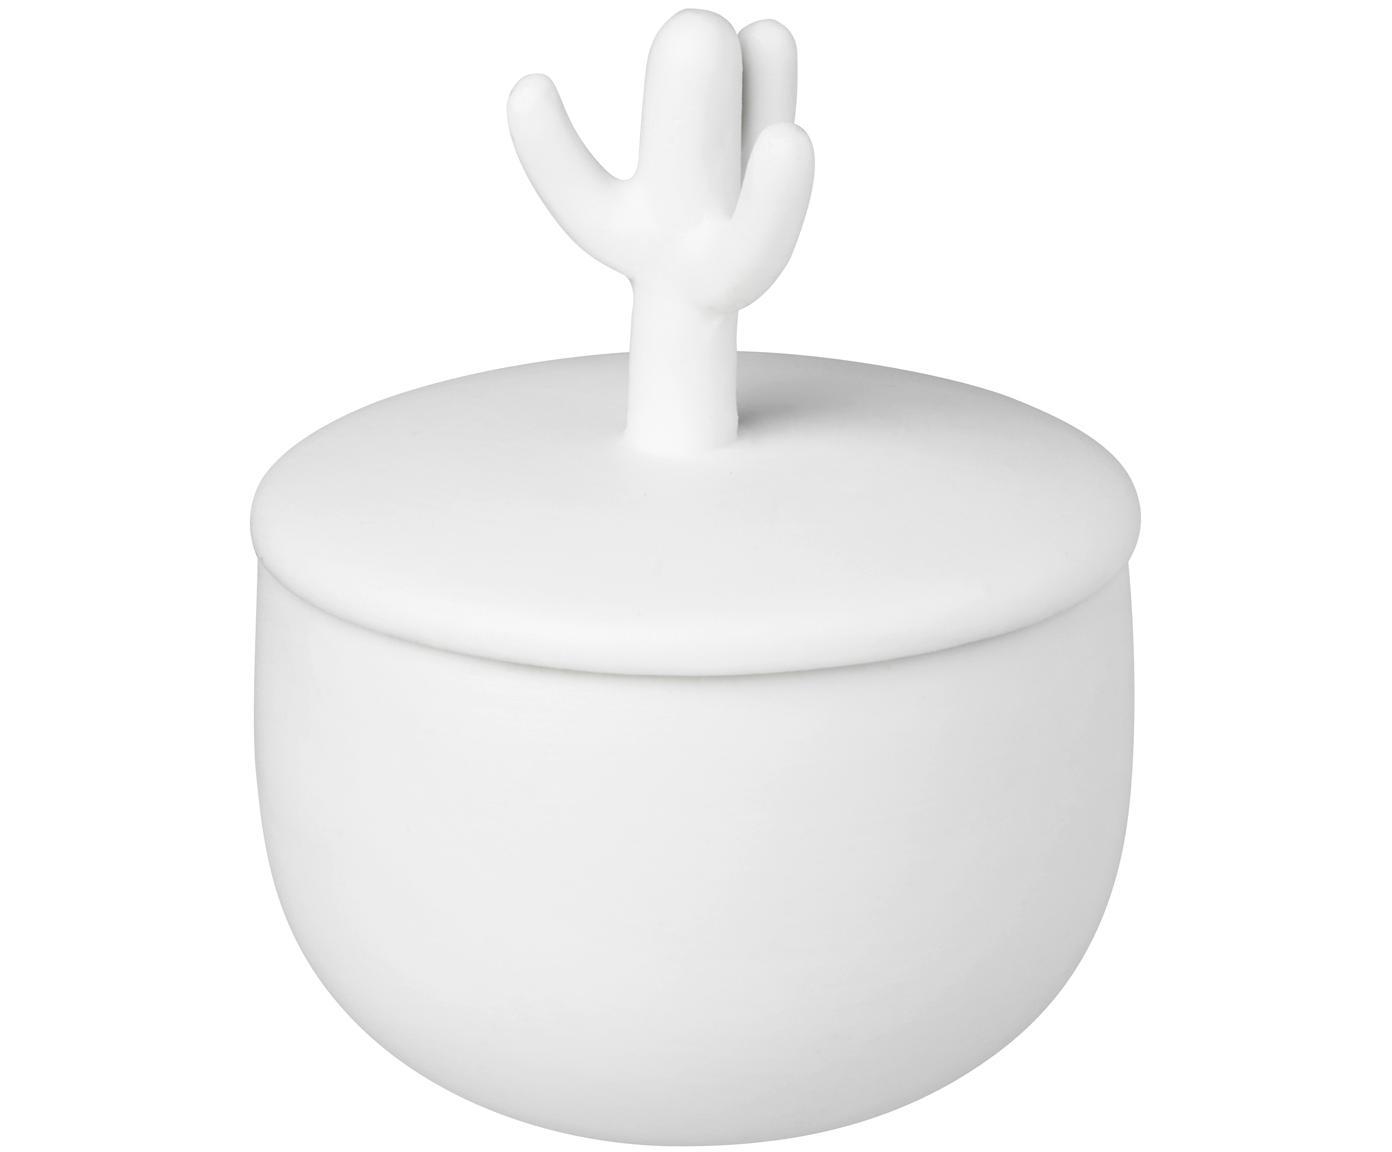 Bote decorativo pequeño Kaktus, Porcelana, Blanco, Ø 4 x Al 6 cm